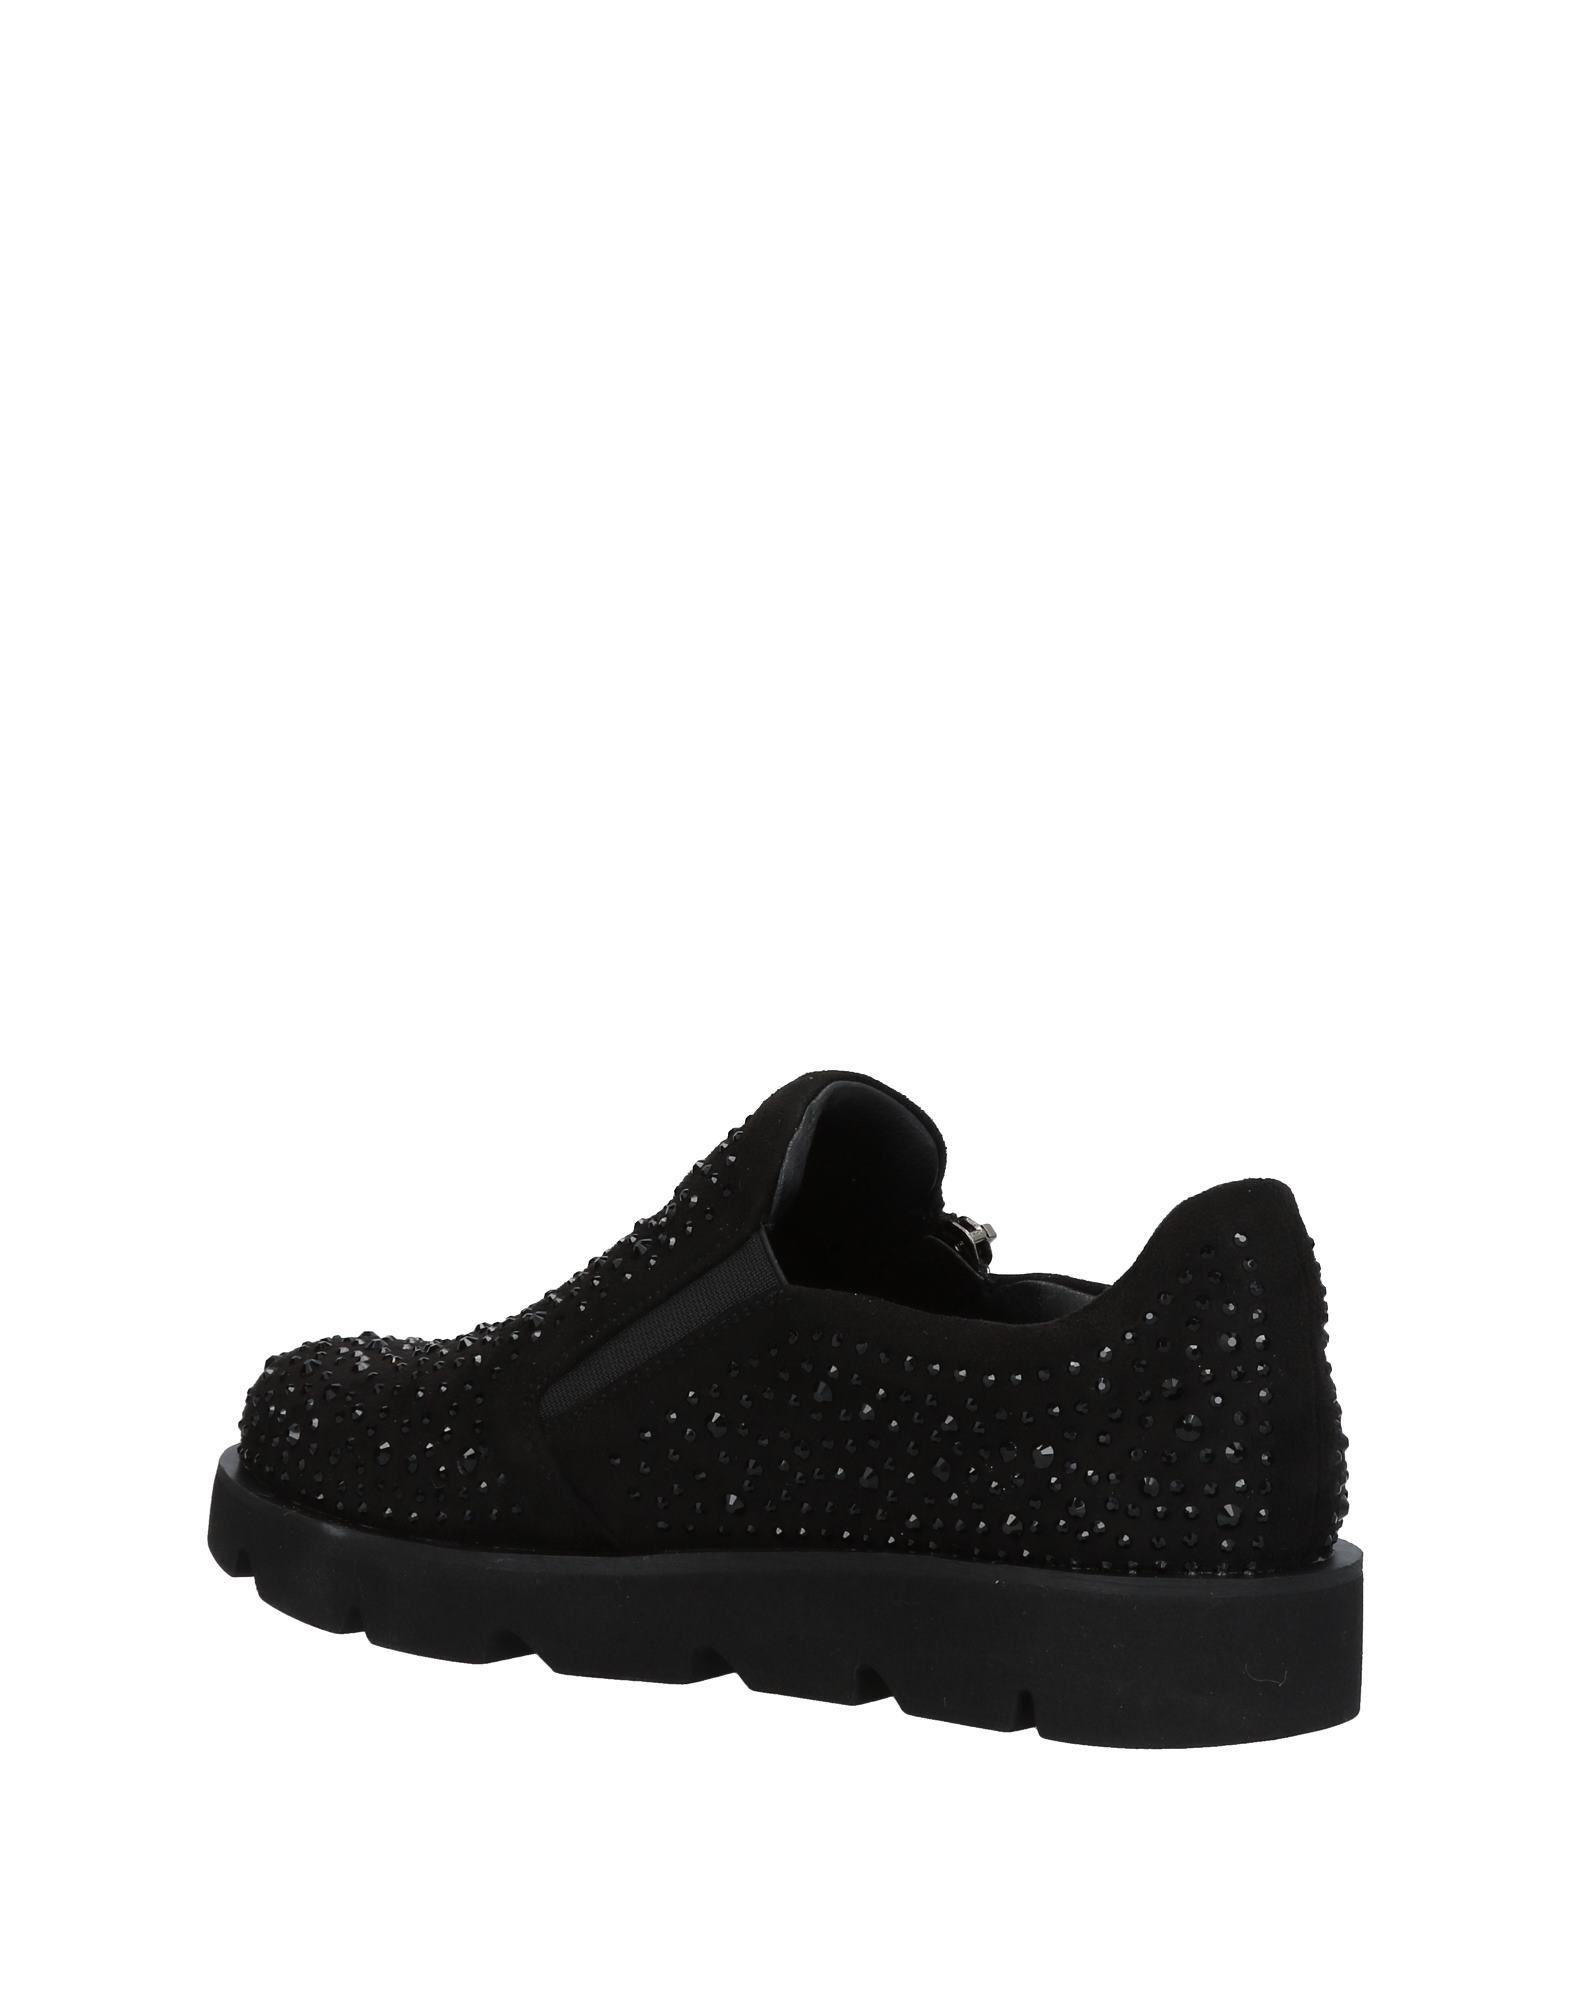 Tua By Braccialini Sneakers Damen  11448746PL Gute Qualität beliebte Schuhe